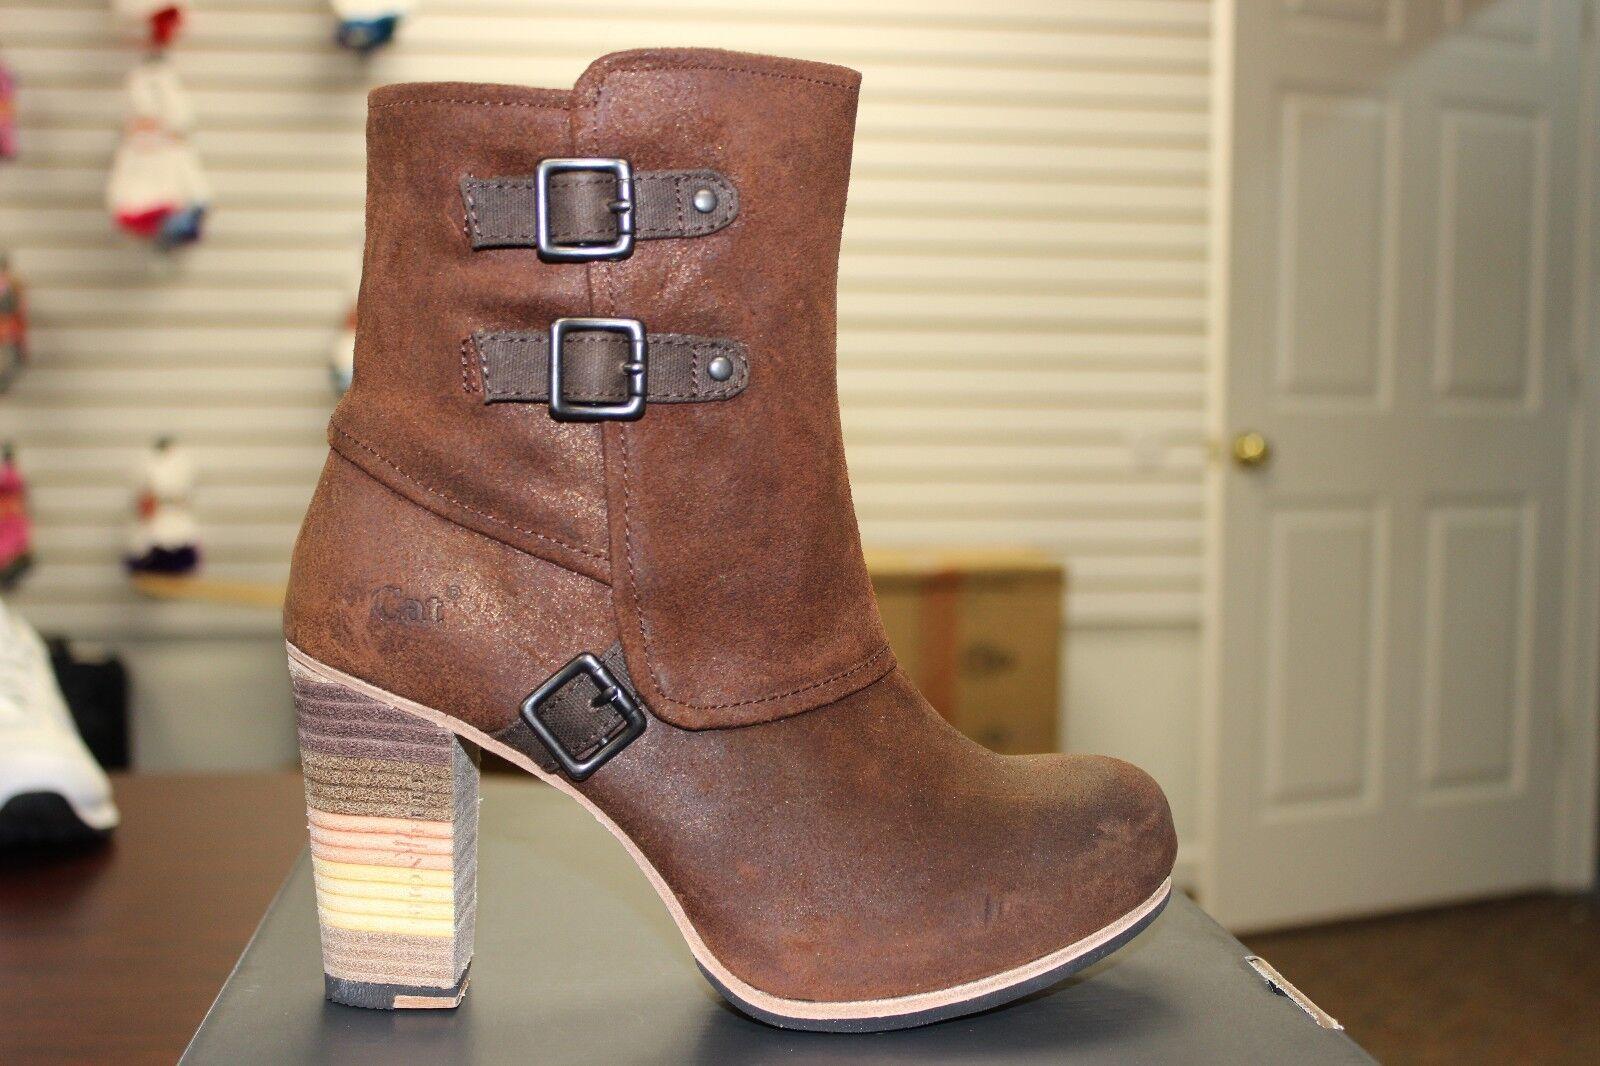 Mujer Mujer Mujer Caterpillar Bajan 22.9cm botas Bronce P305845 Piel Premium  costo real